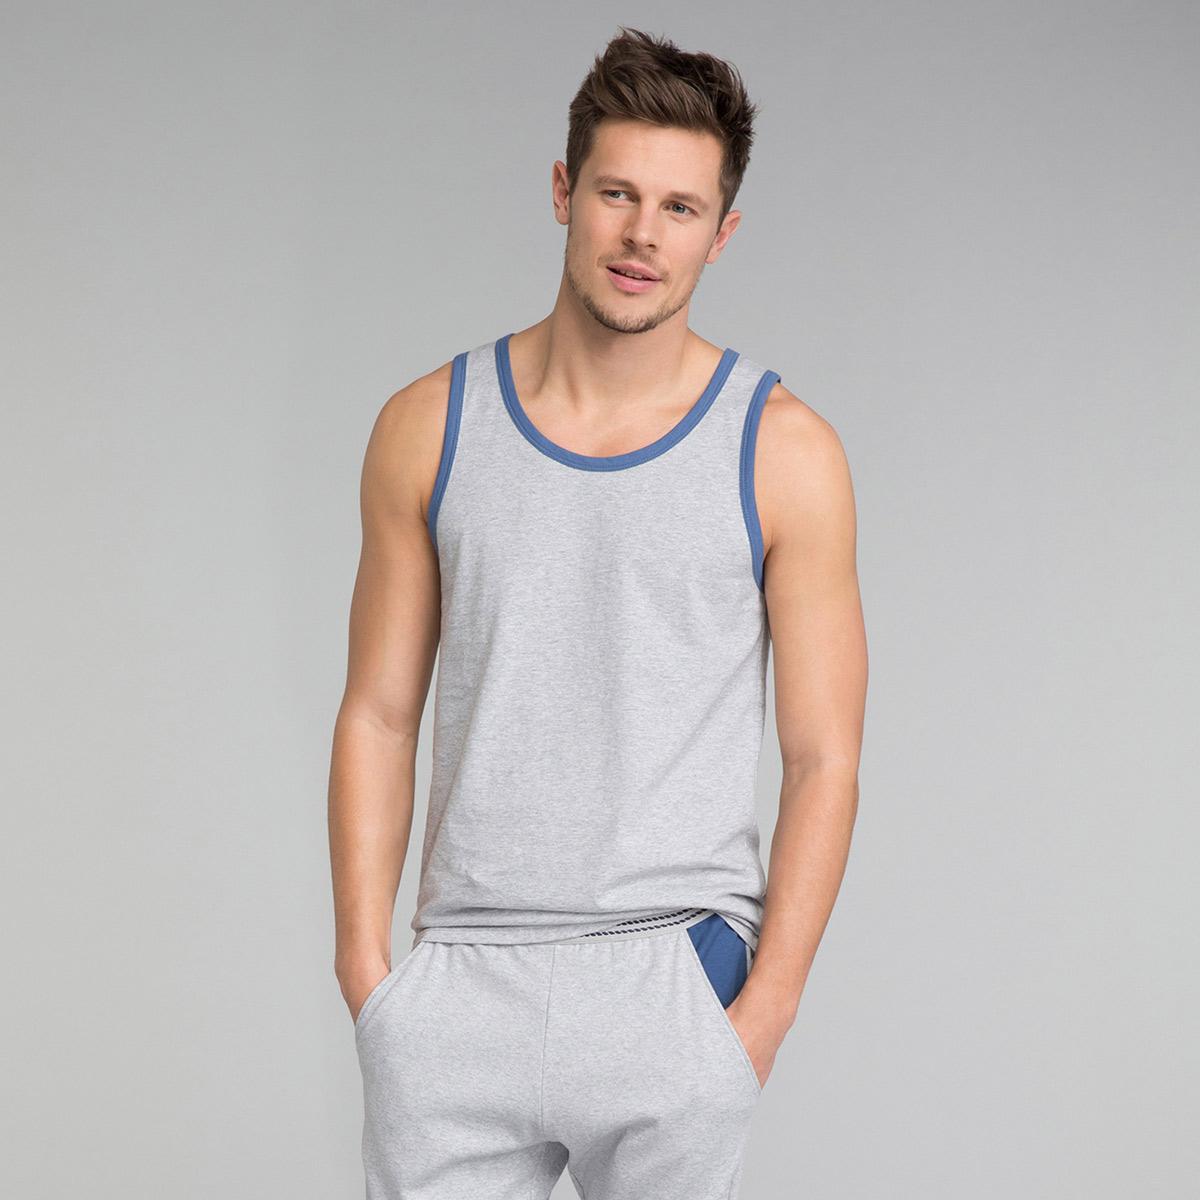 Débardeur pyjama gris chiné détail bleu indigo